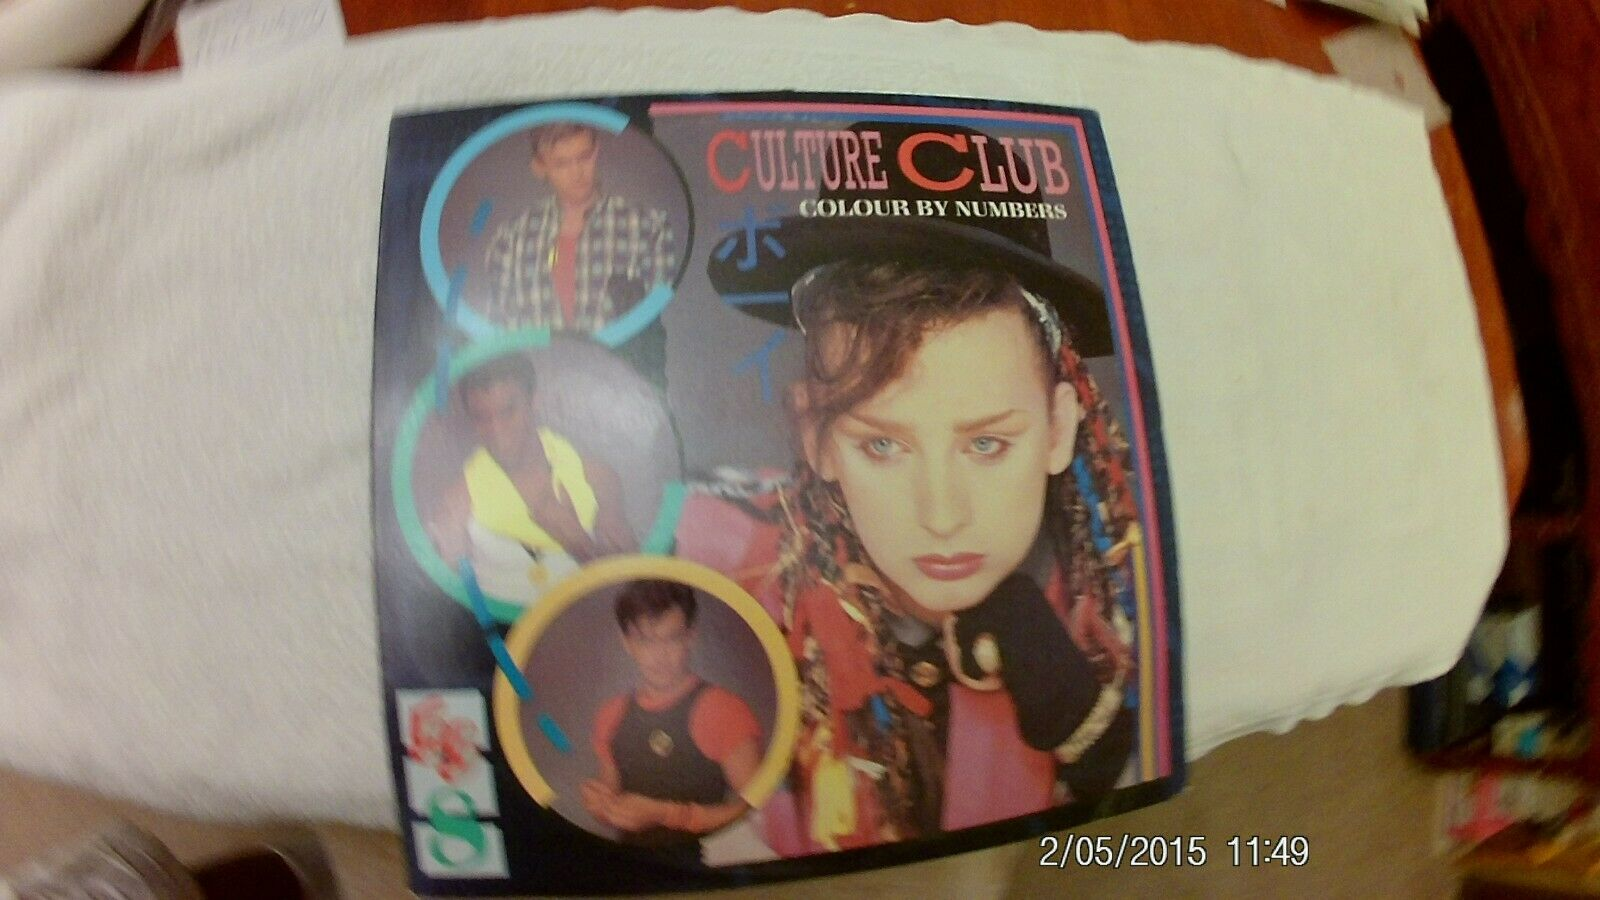 CULTURE CLUB - COLOUR BY NUMBERS - LP 1983 Virgin Rock Pop - $7.00